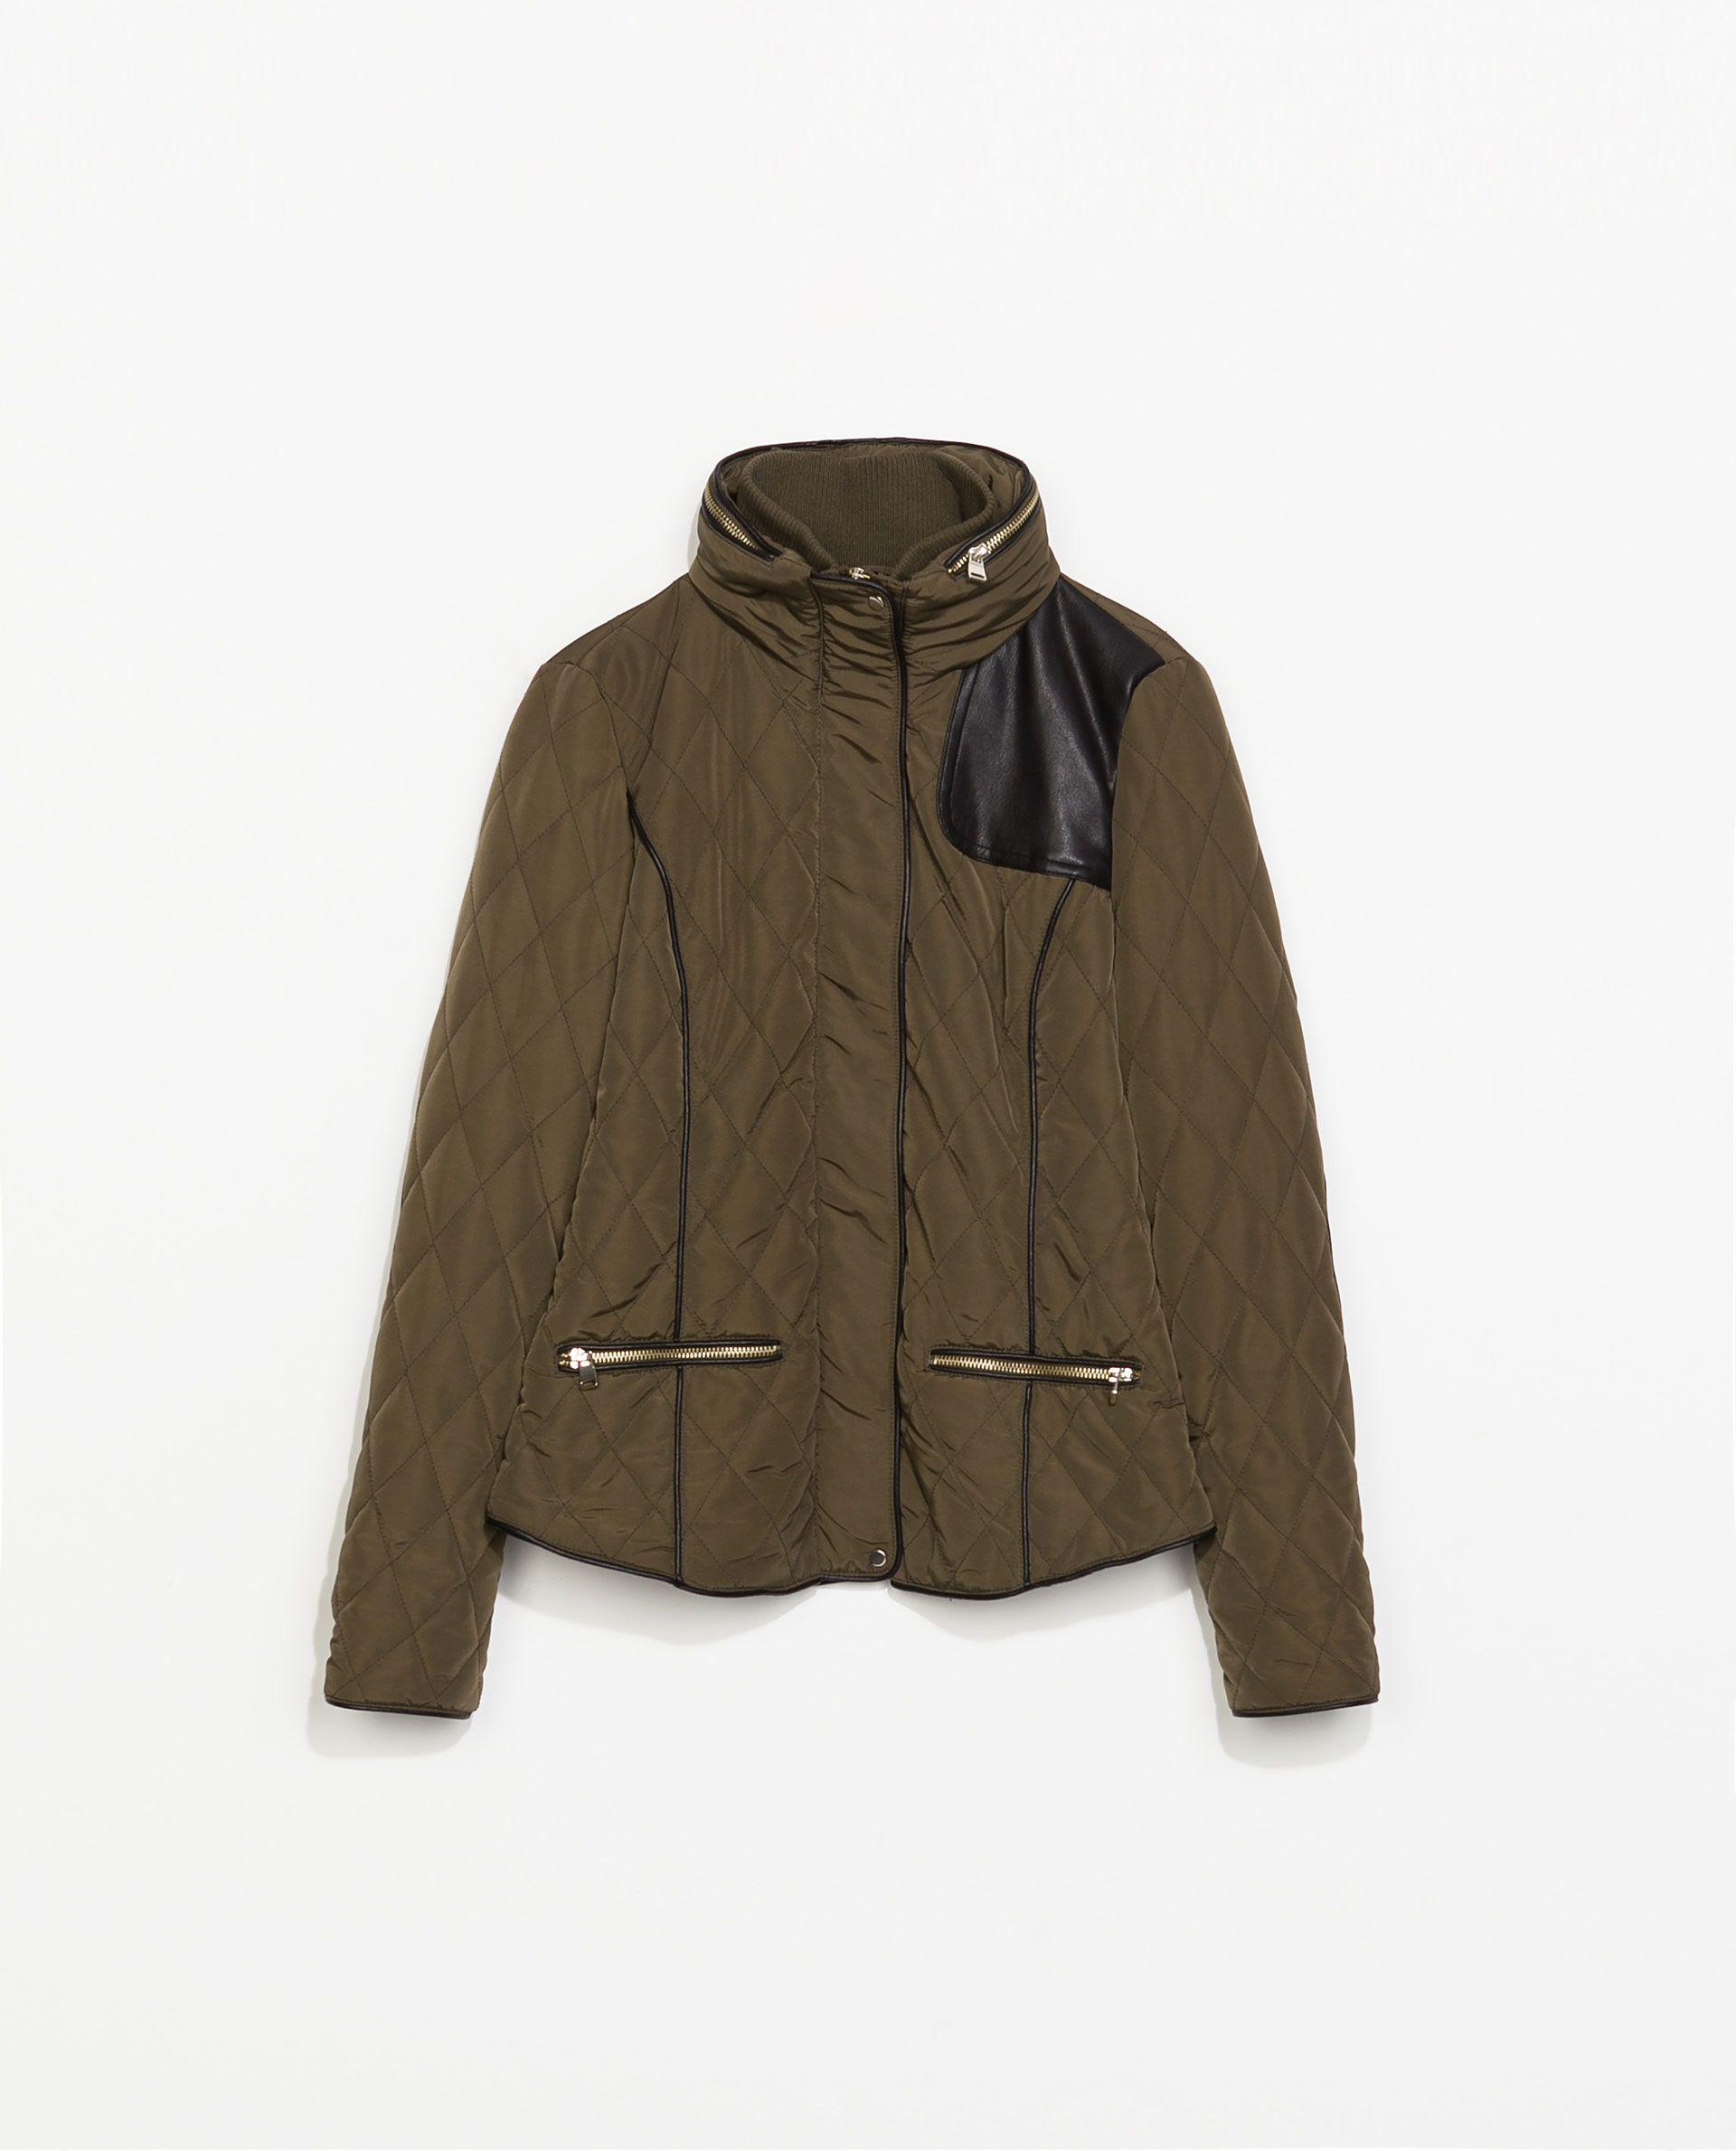 http://www.zara.com/us/en/sale/woman/outerwear/combination-quilted-jacket-c437599p1667462.html